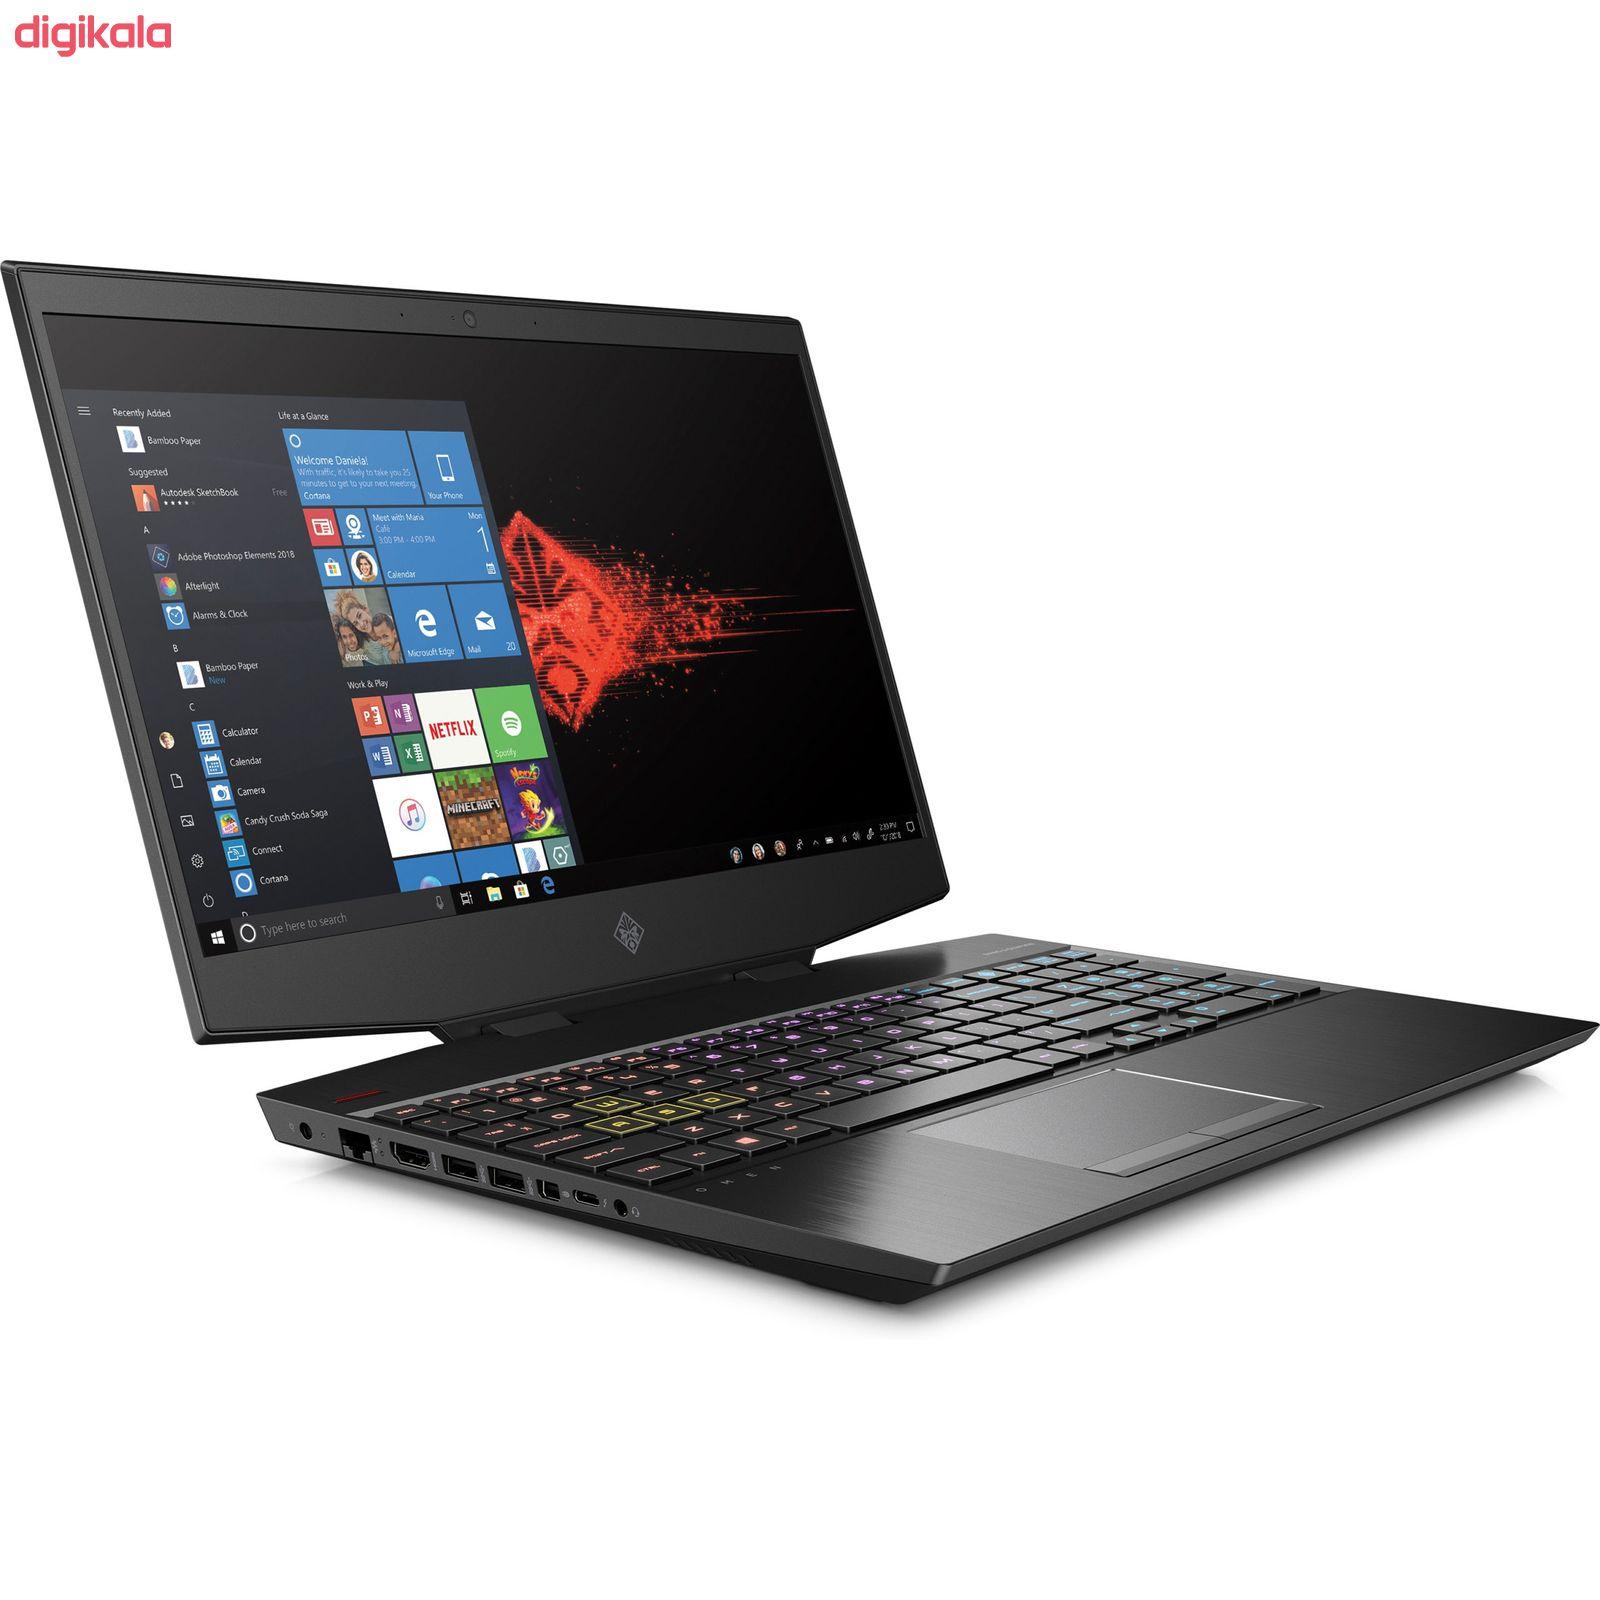 لپ تاپ 15.6 اینچی اچپی مدل OMEN 15-DH1050-B